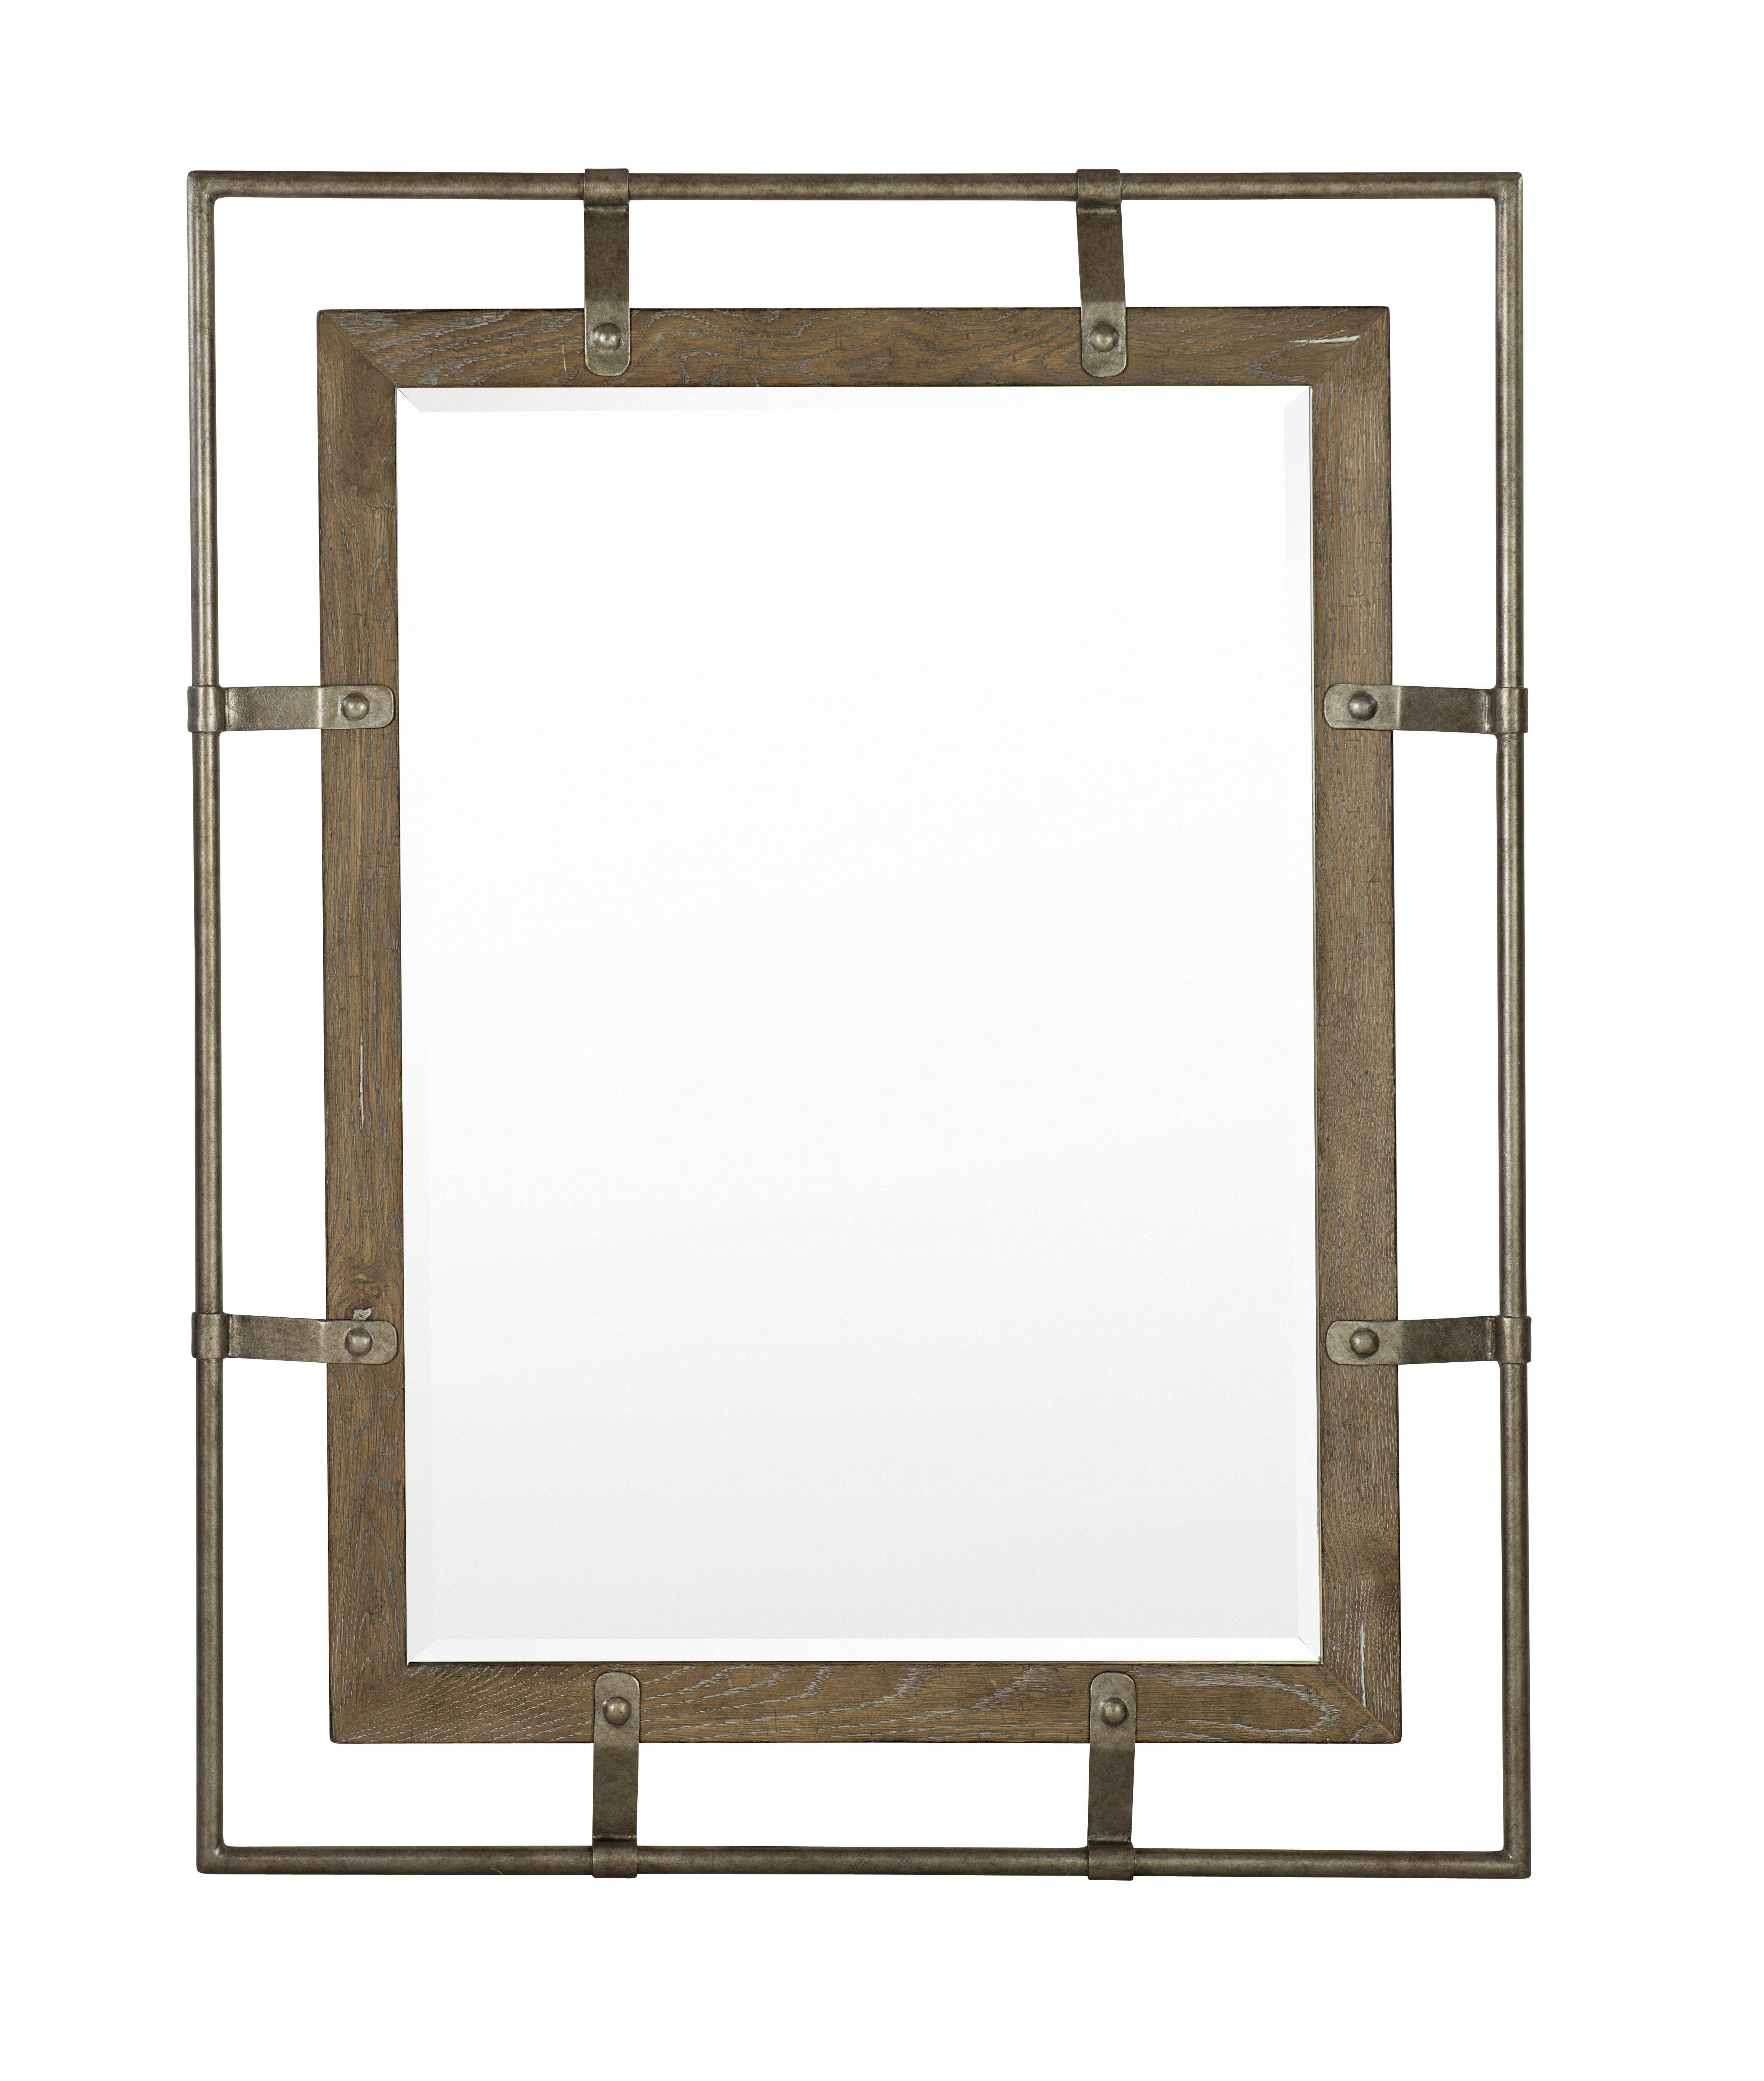 Bernhardt Rustic Patina Industrial Beveled Distressed Accent Mirror Perigold